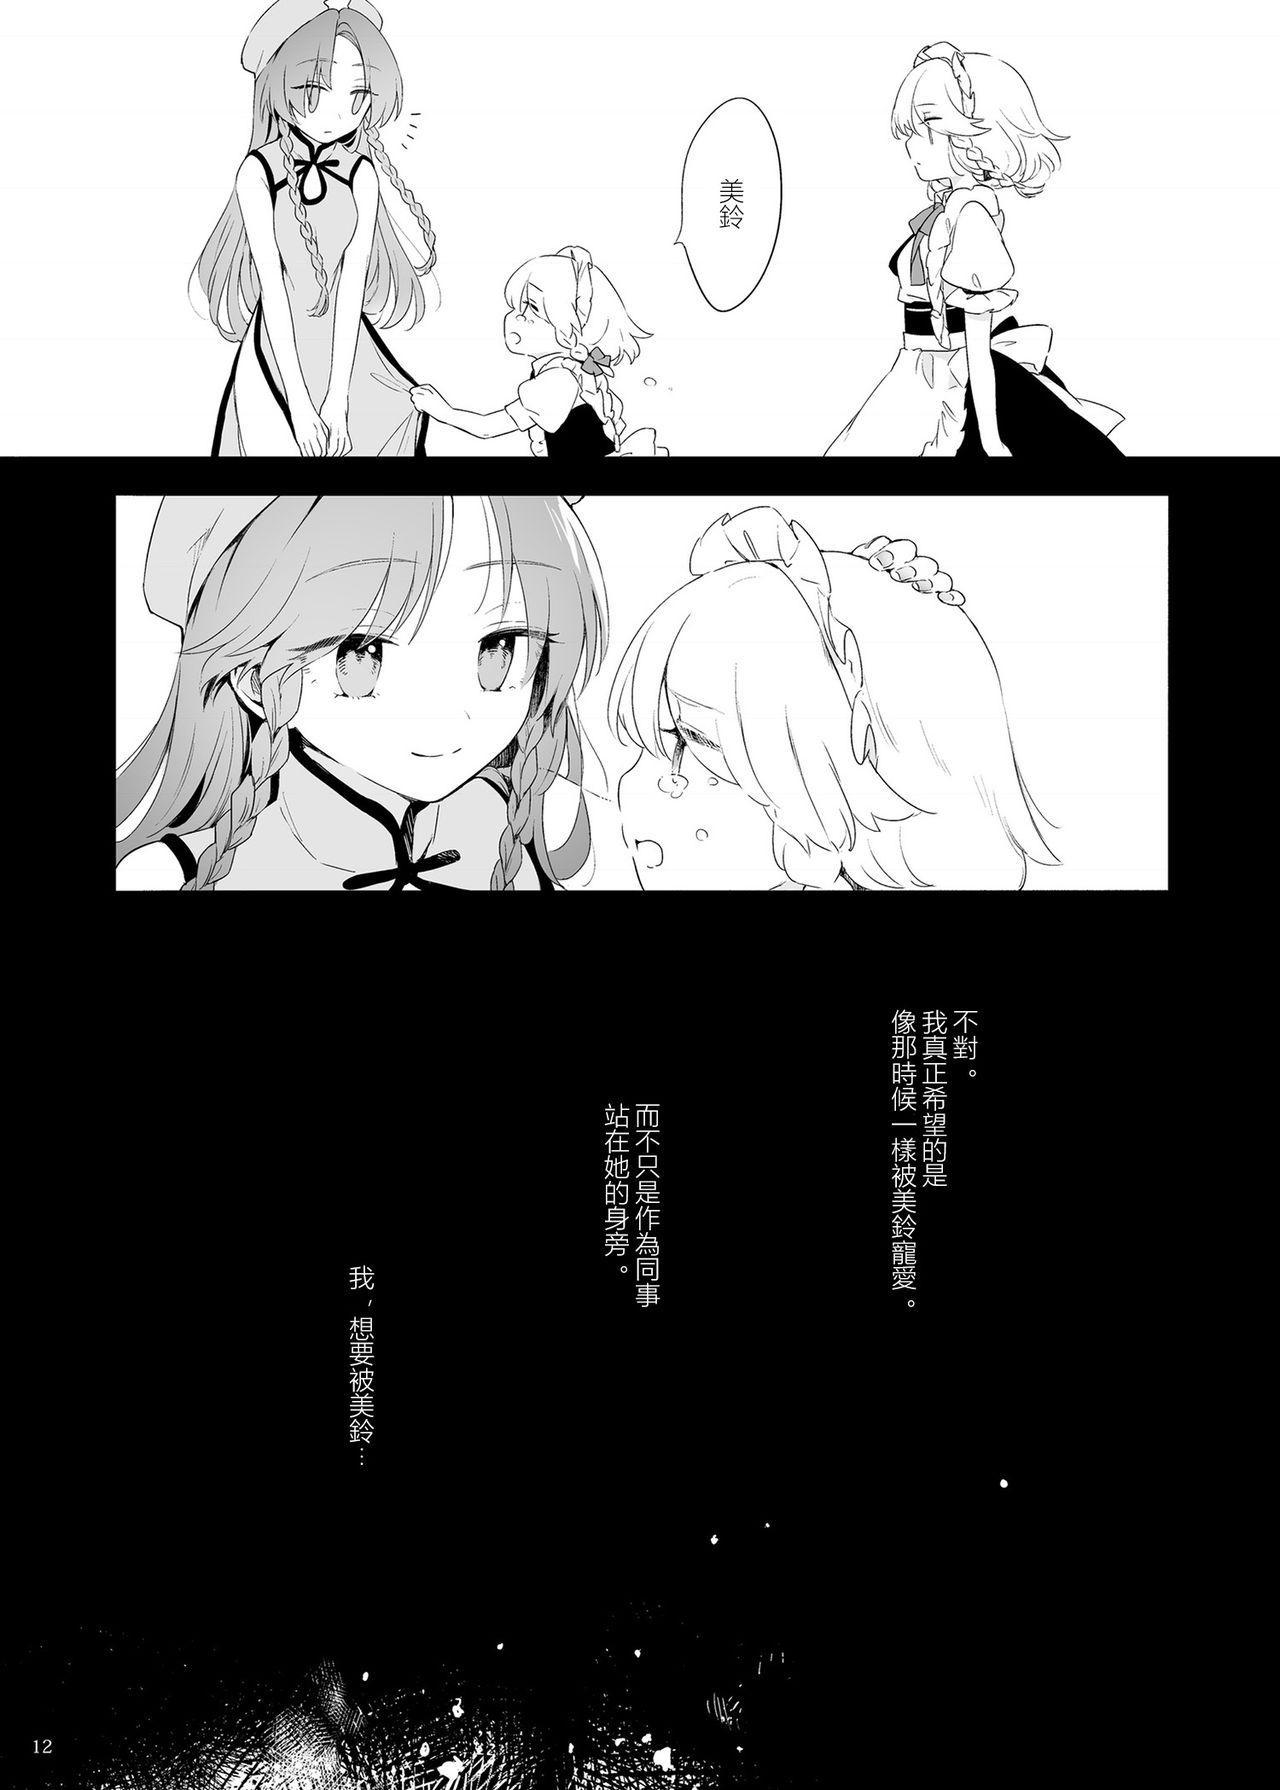 Meiling ni Kawaigarareru Sakuya-san ga Mitai Hon   想看被美鈴寵愛的咲夜小姐的同人本 11